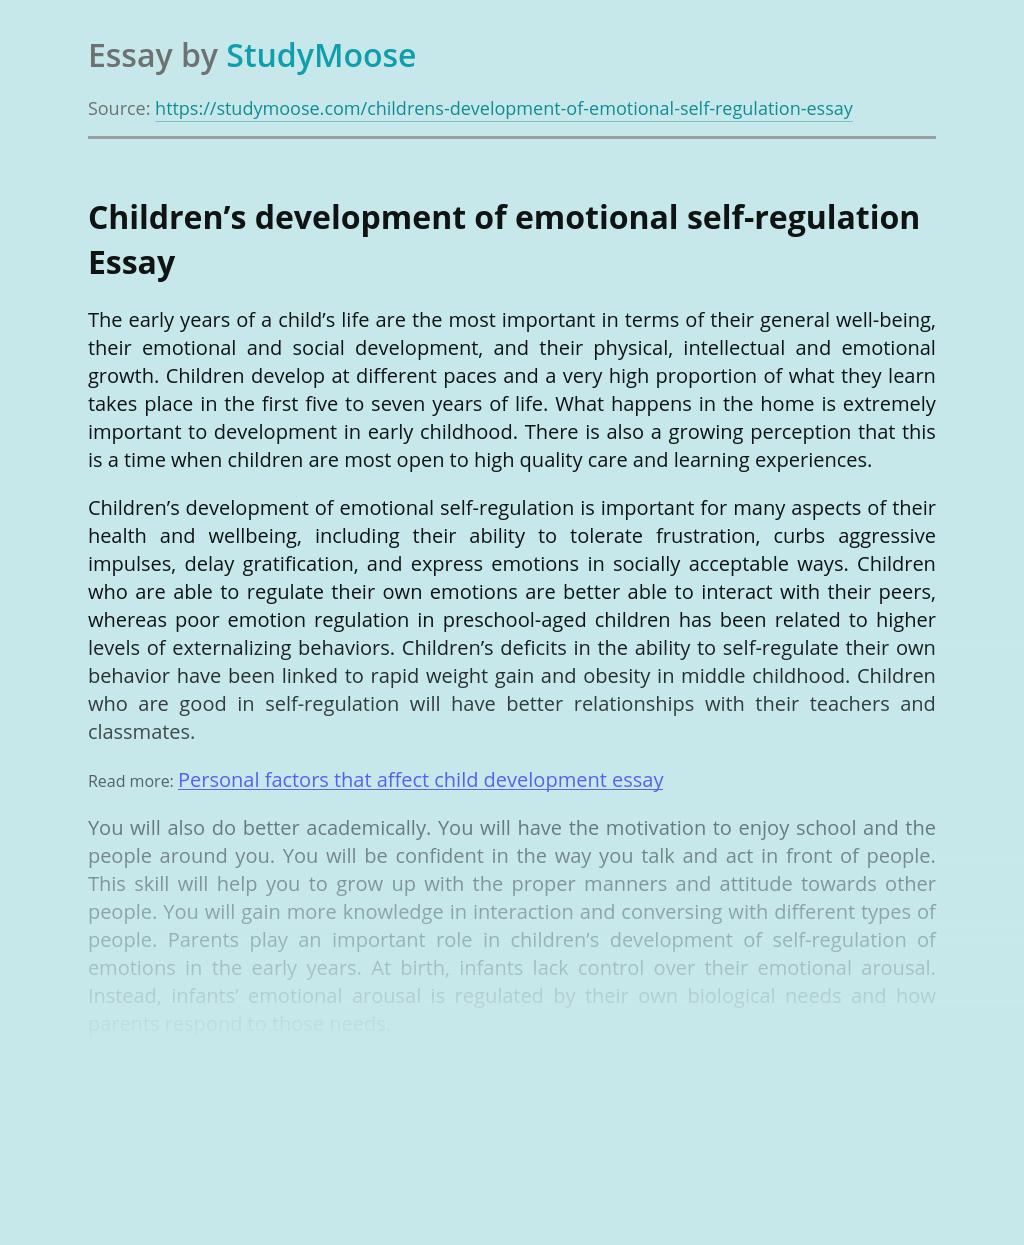 Children's development of emotional self-regulation